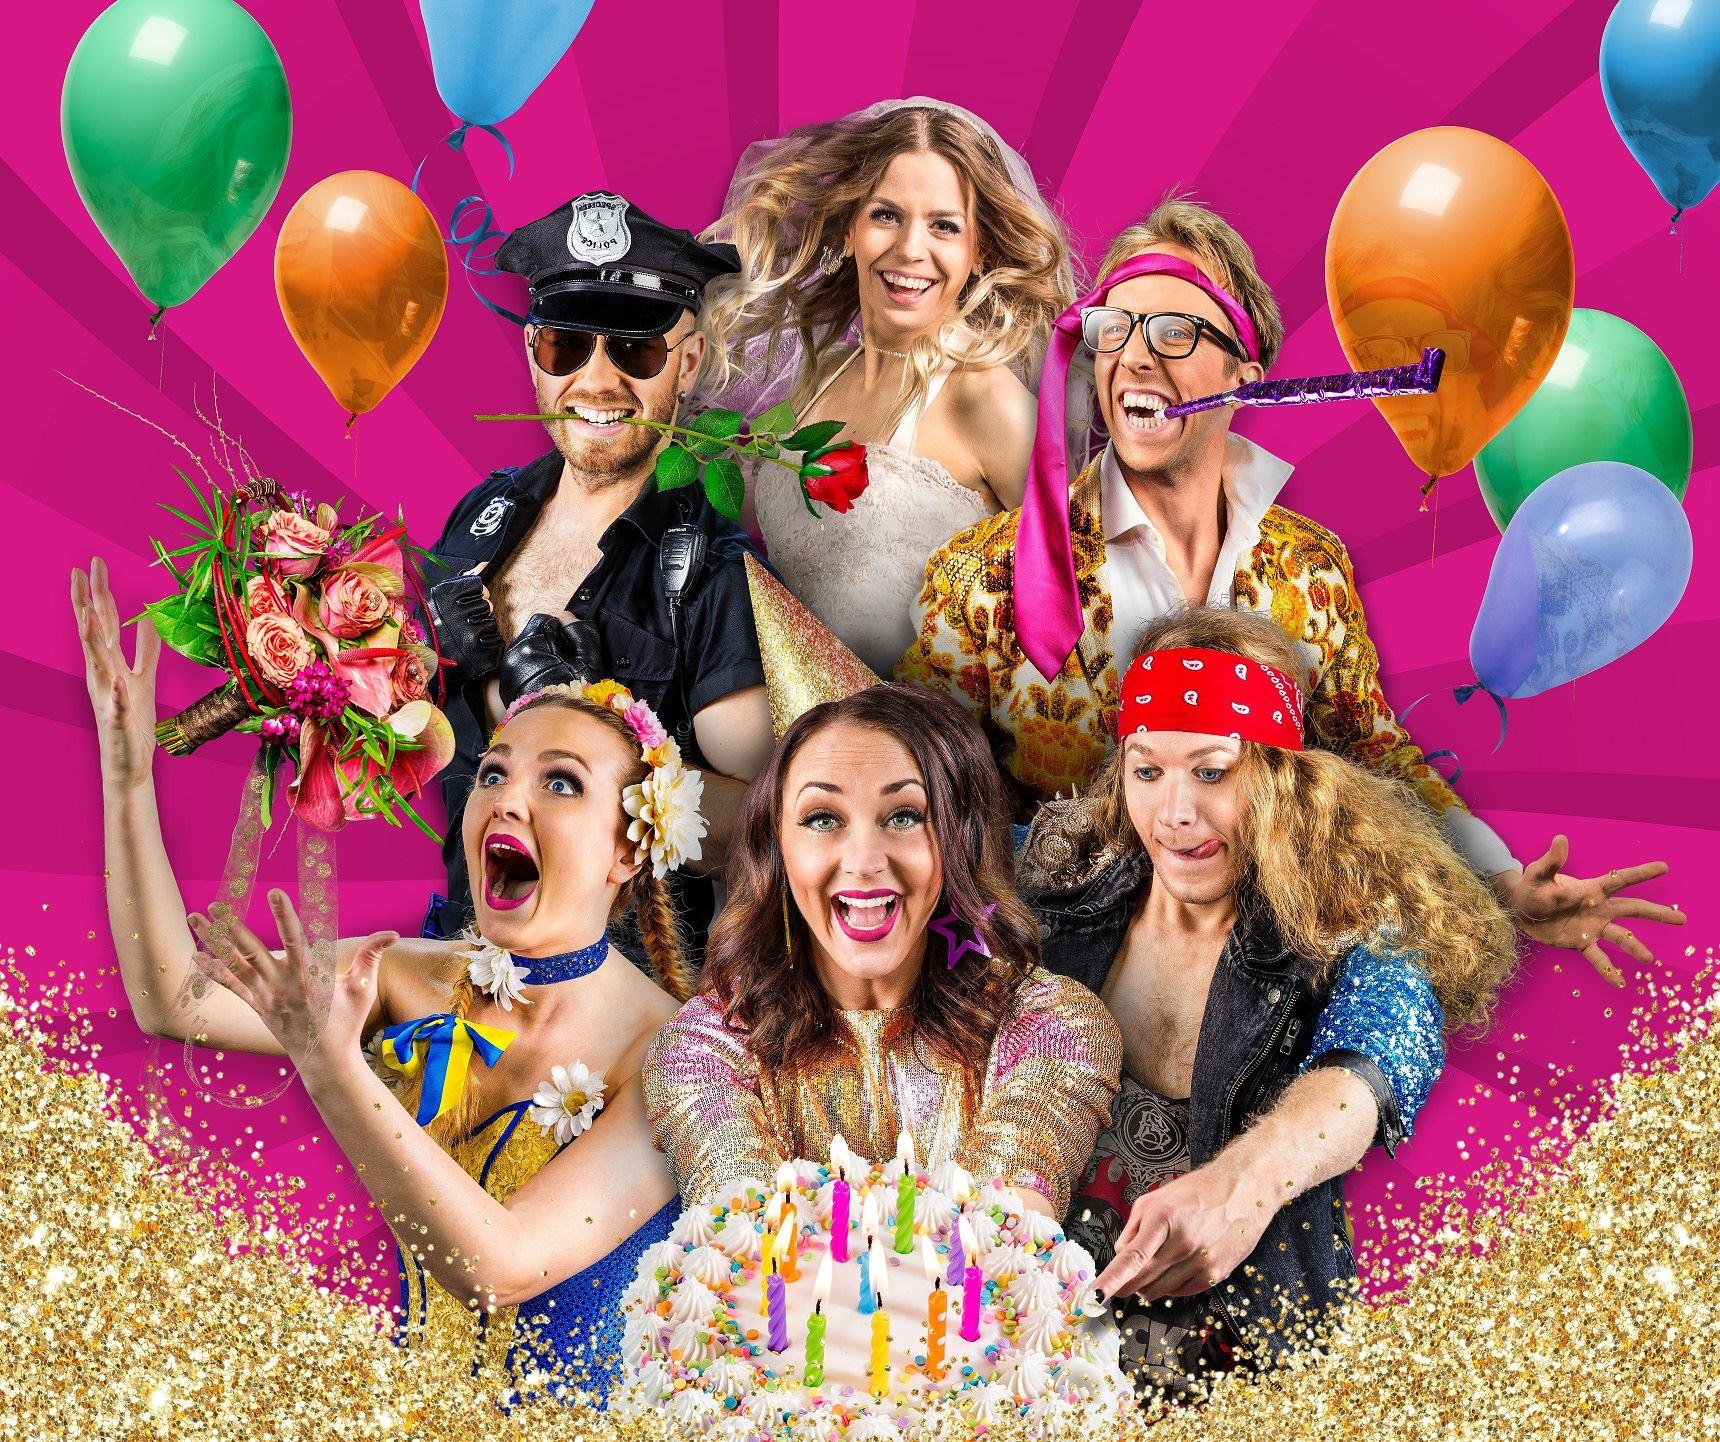 GOLDEN HITS - 25-årsfesten - Vår show på entréplan